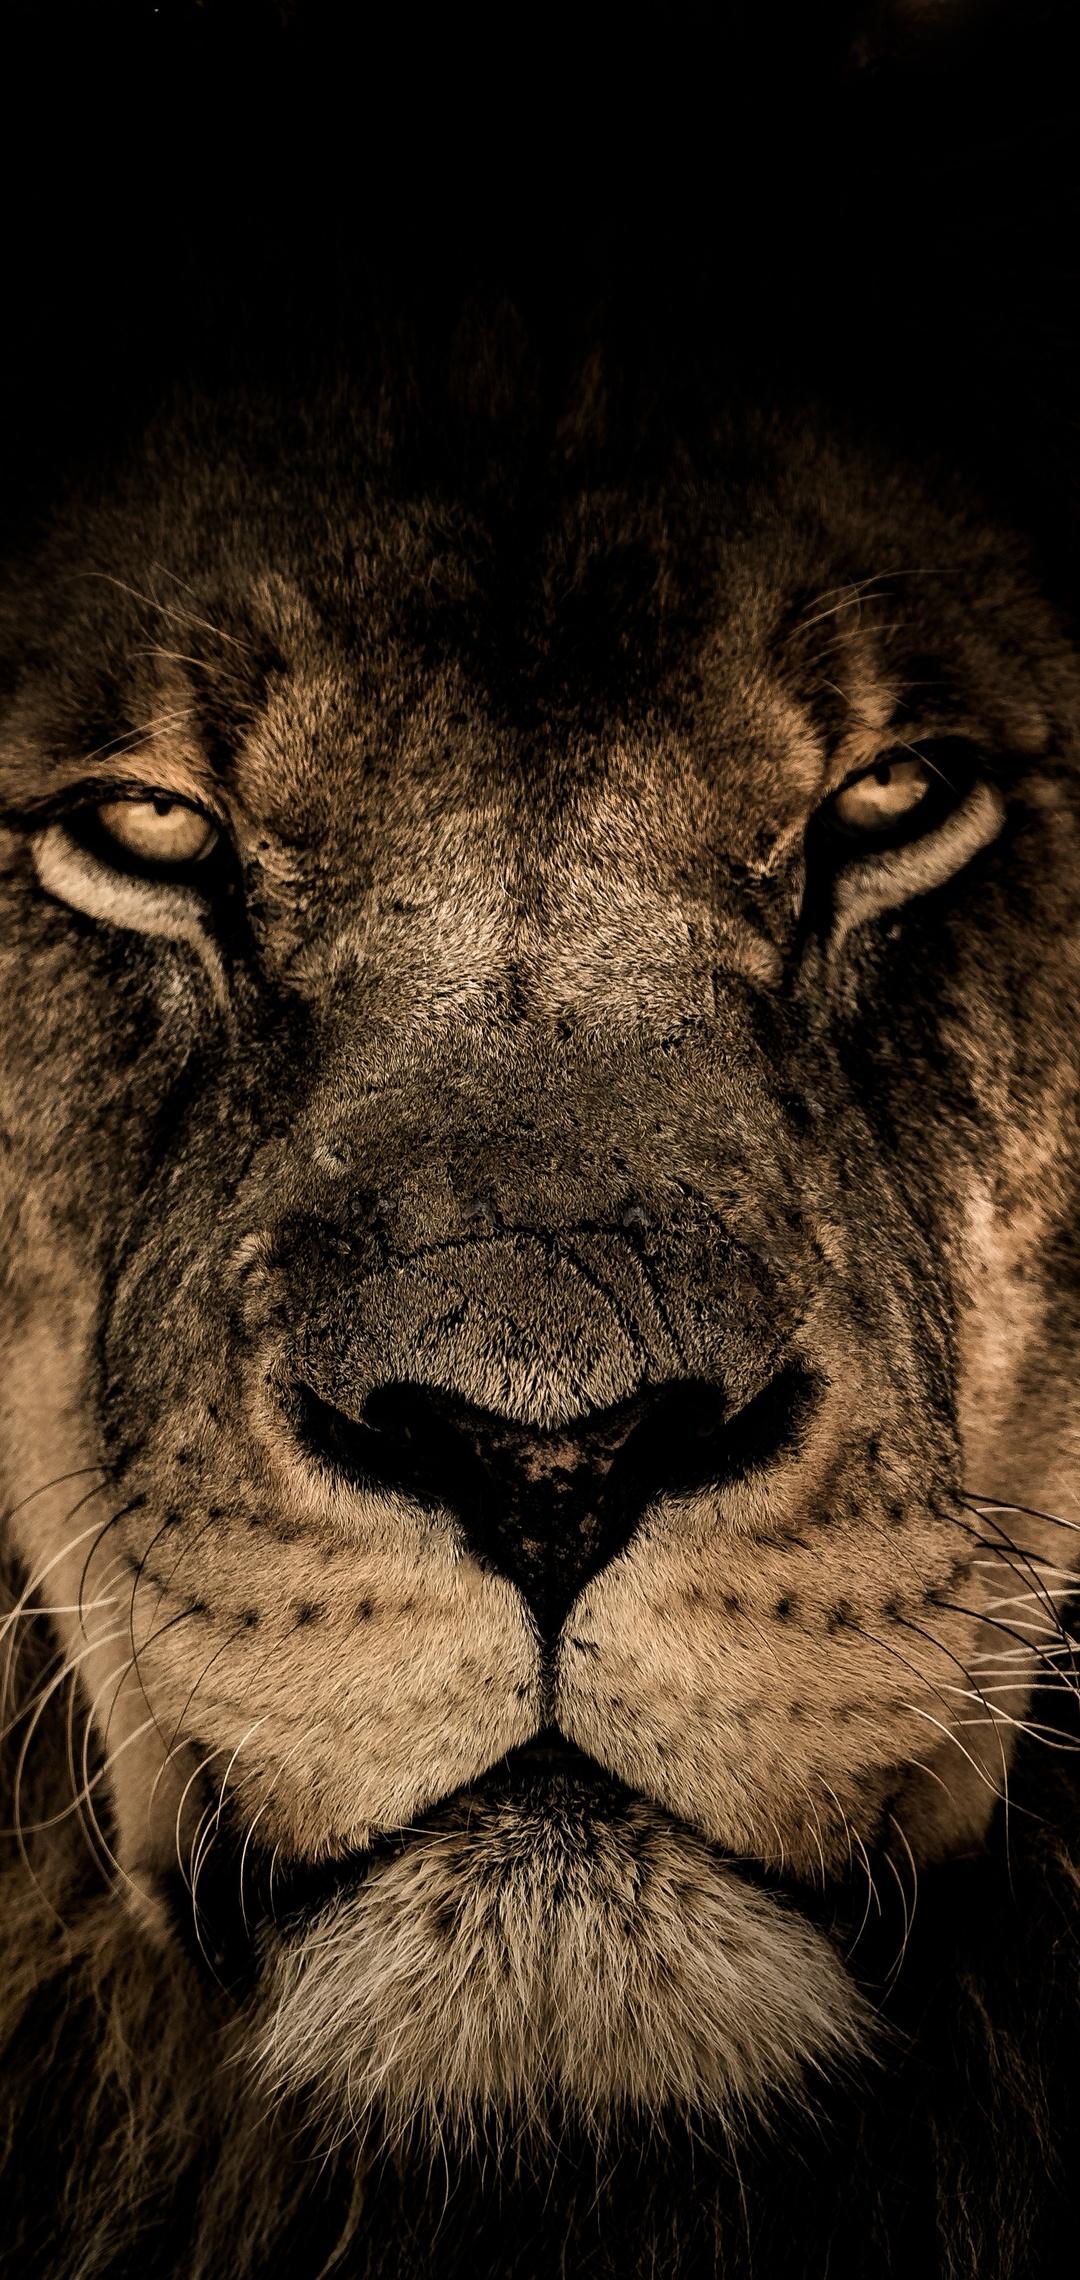 african-lion-face-closeup-5k-ap.jpg